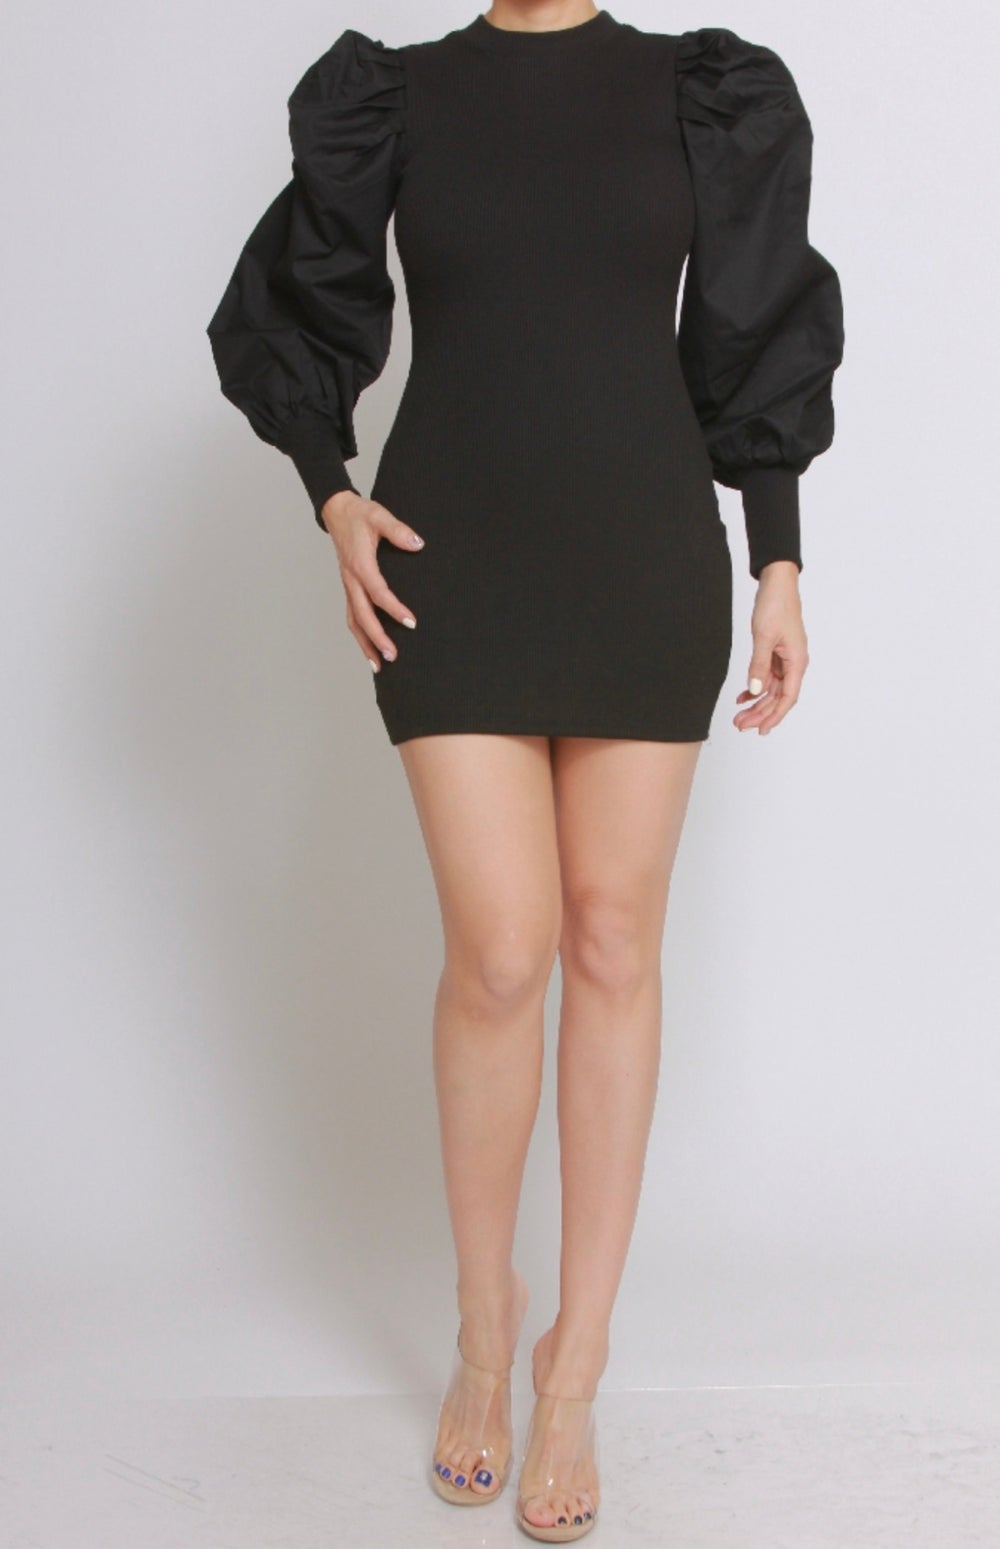 Image of Puff Sleeve Dress (Black)